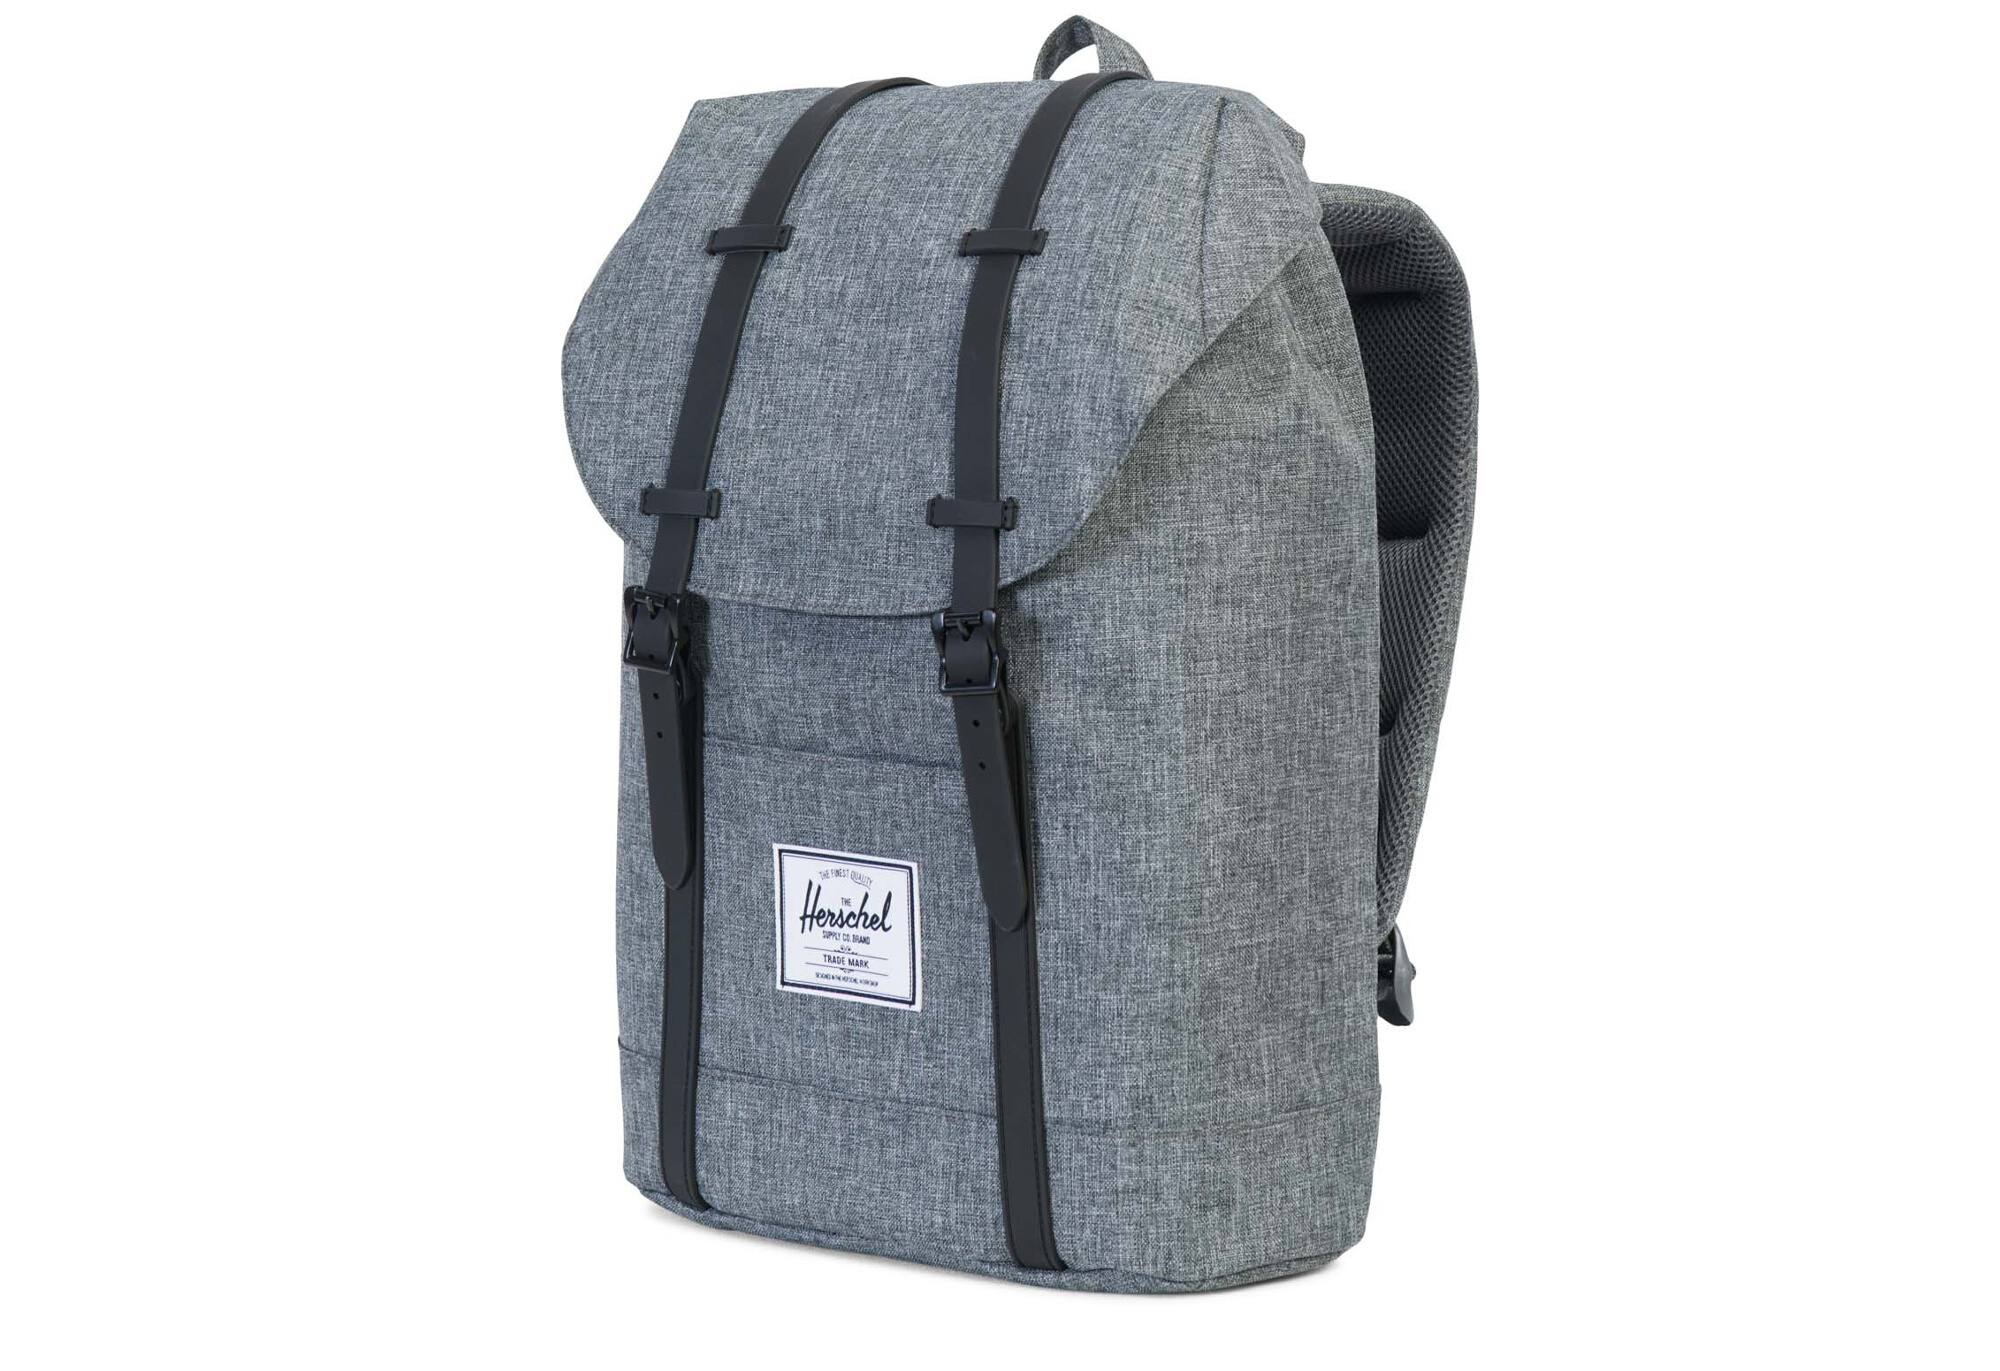 82537d090f78 HERSCHEL Retreat Backpack 19.5L Raven Crosshatch Black Rubber ...